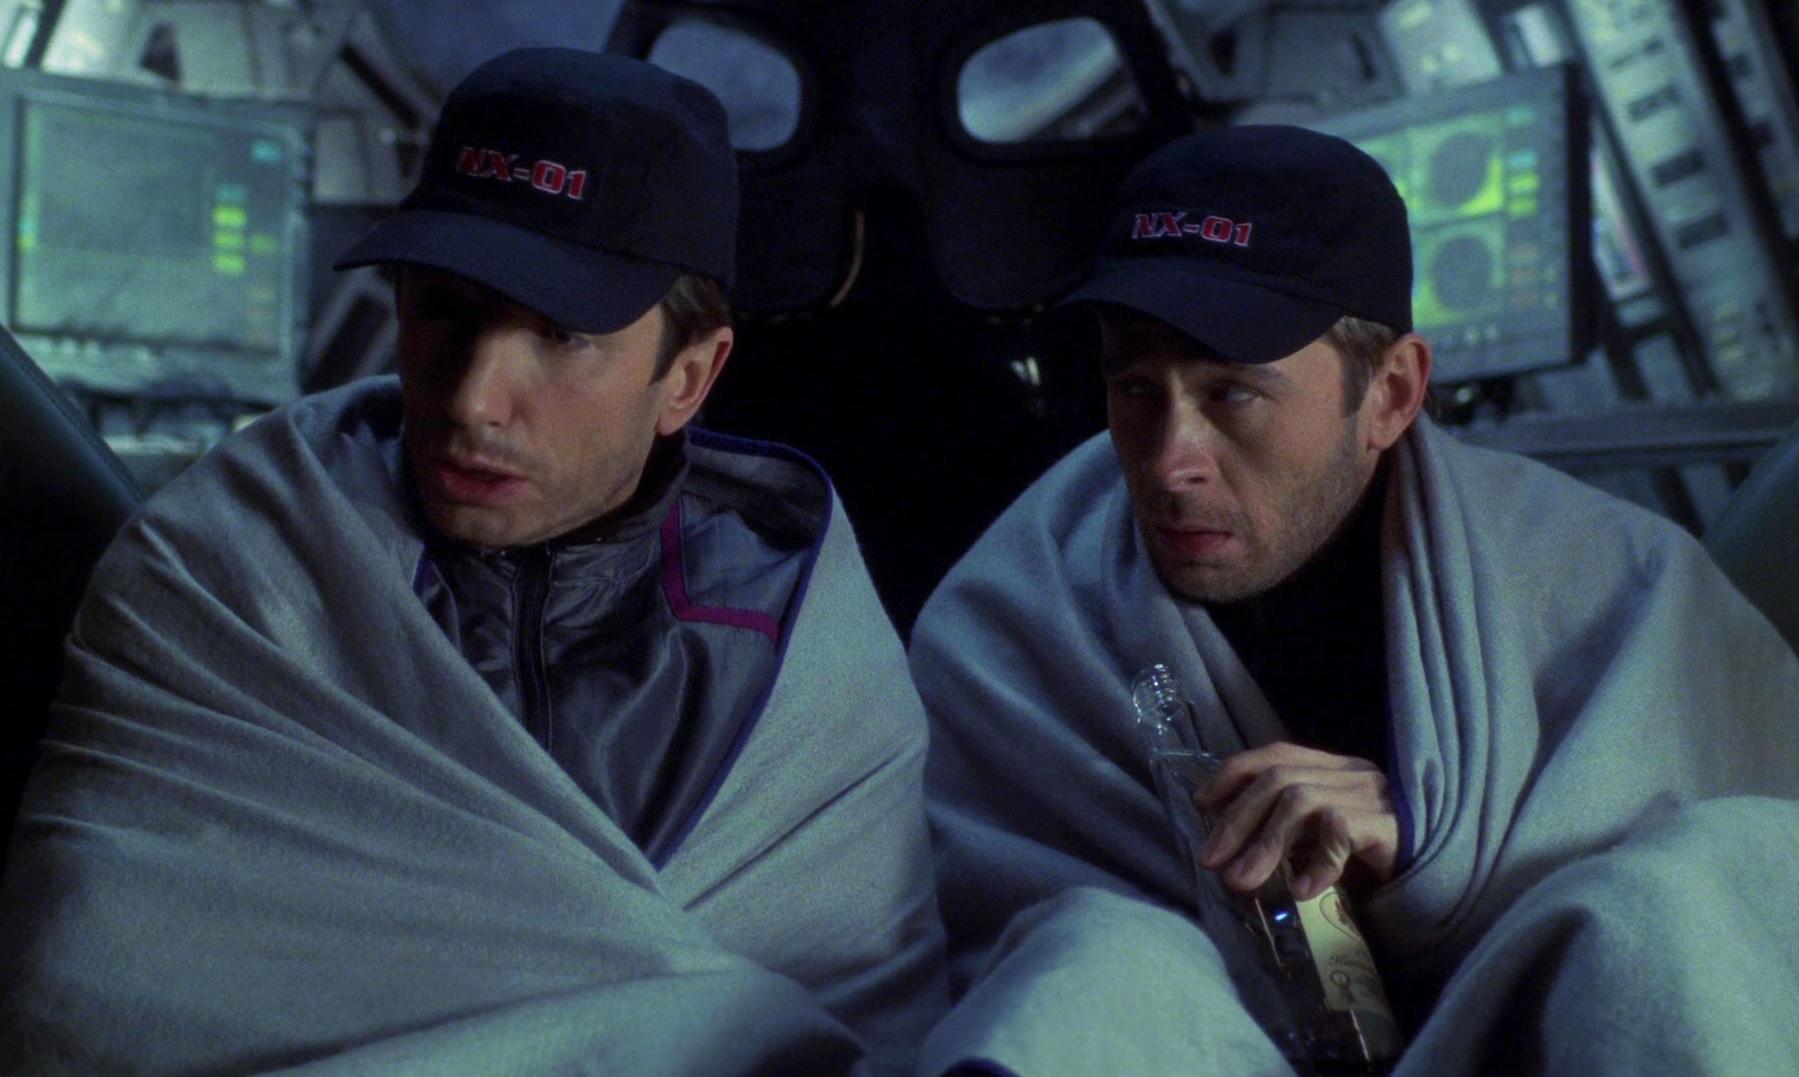 Shuttlepod One (episode)